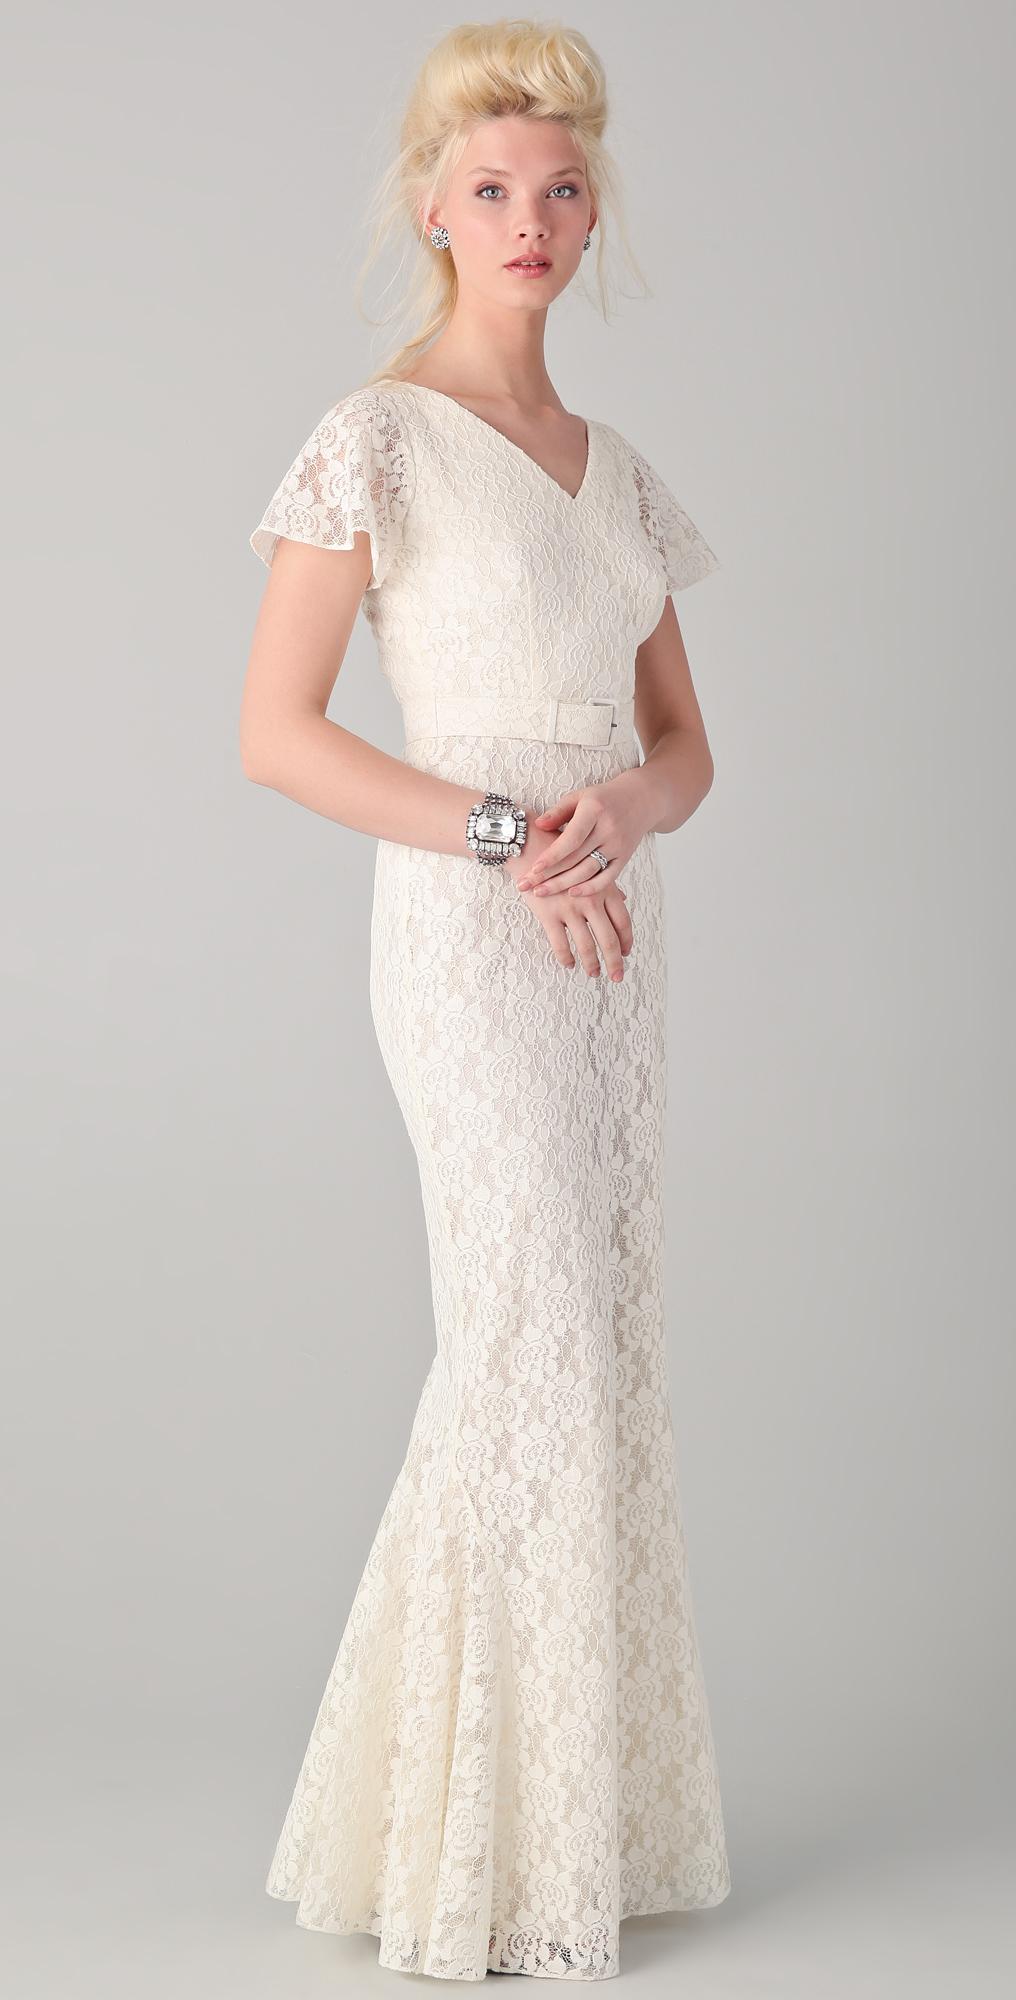 Berühmt Rachel Zoe Wedding Dress Zeitgenössisch - Brautkleider Ideen ...